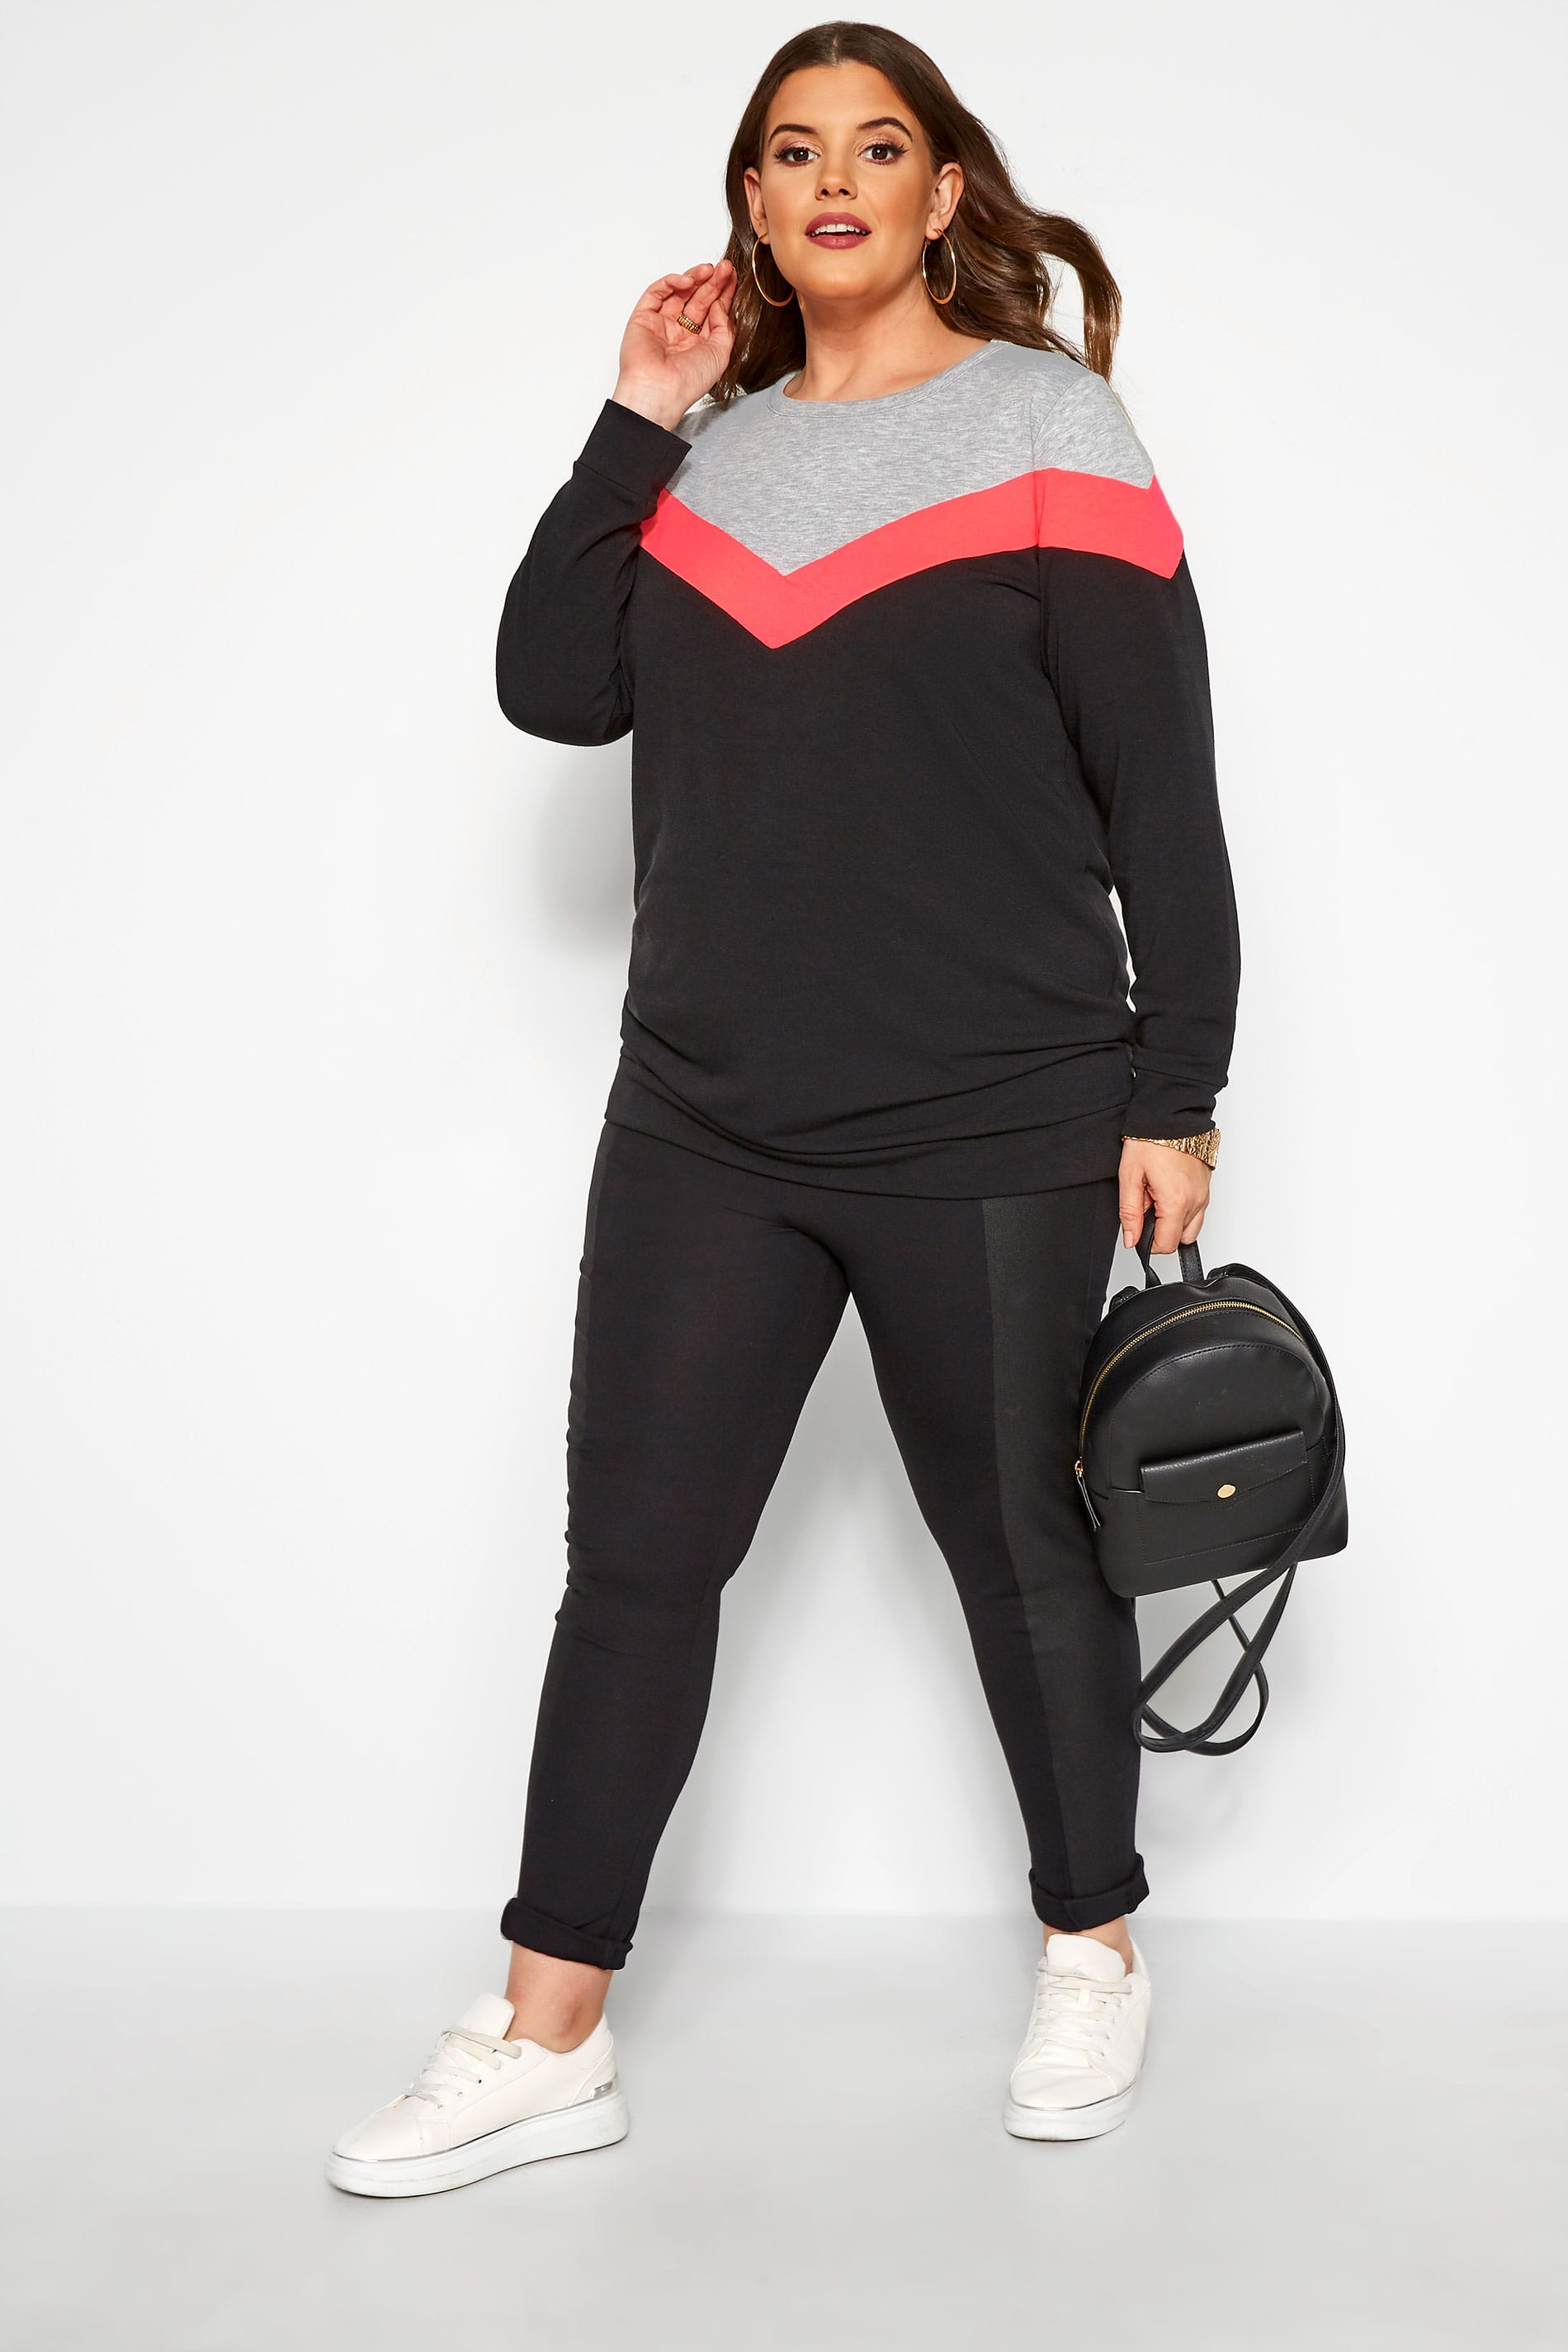 Black & Neon Pink Colour Block Chevron Sweatshirt